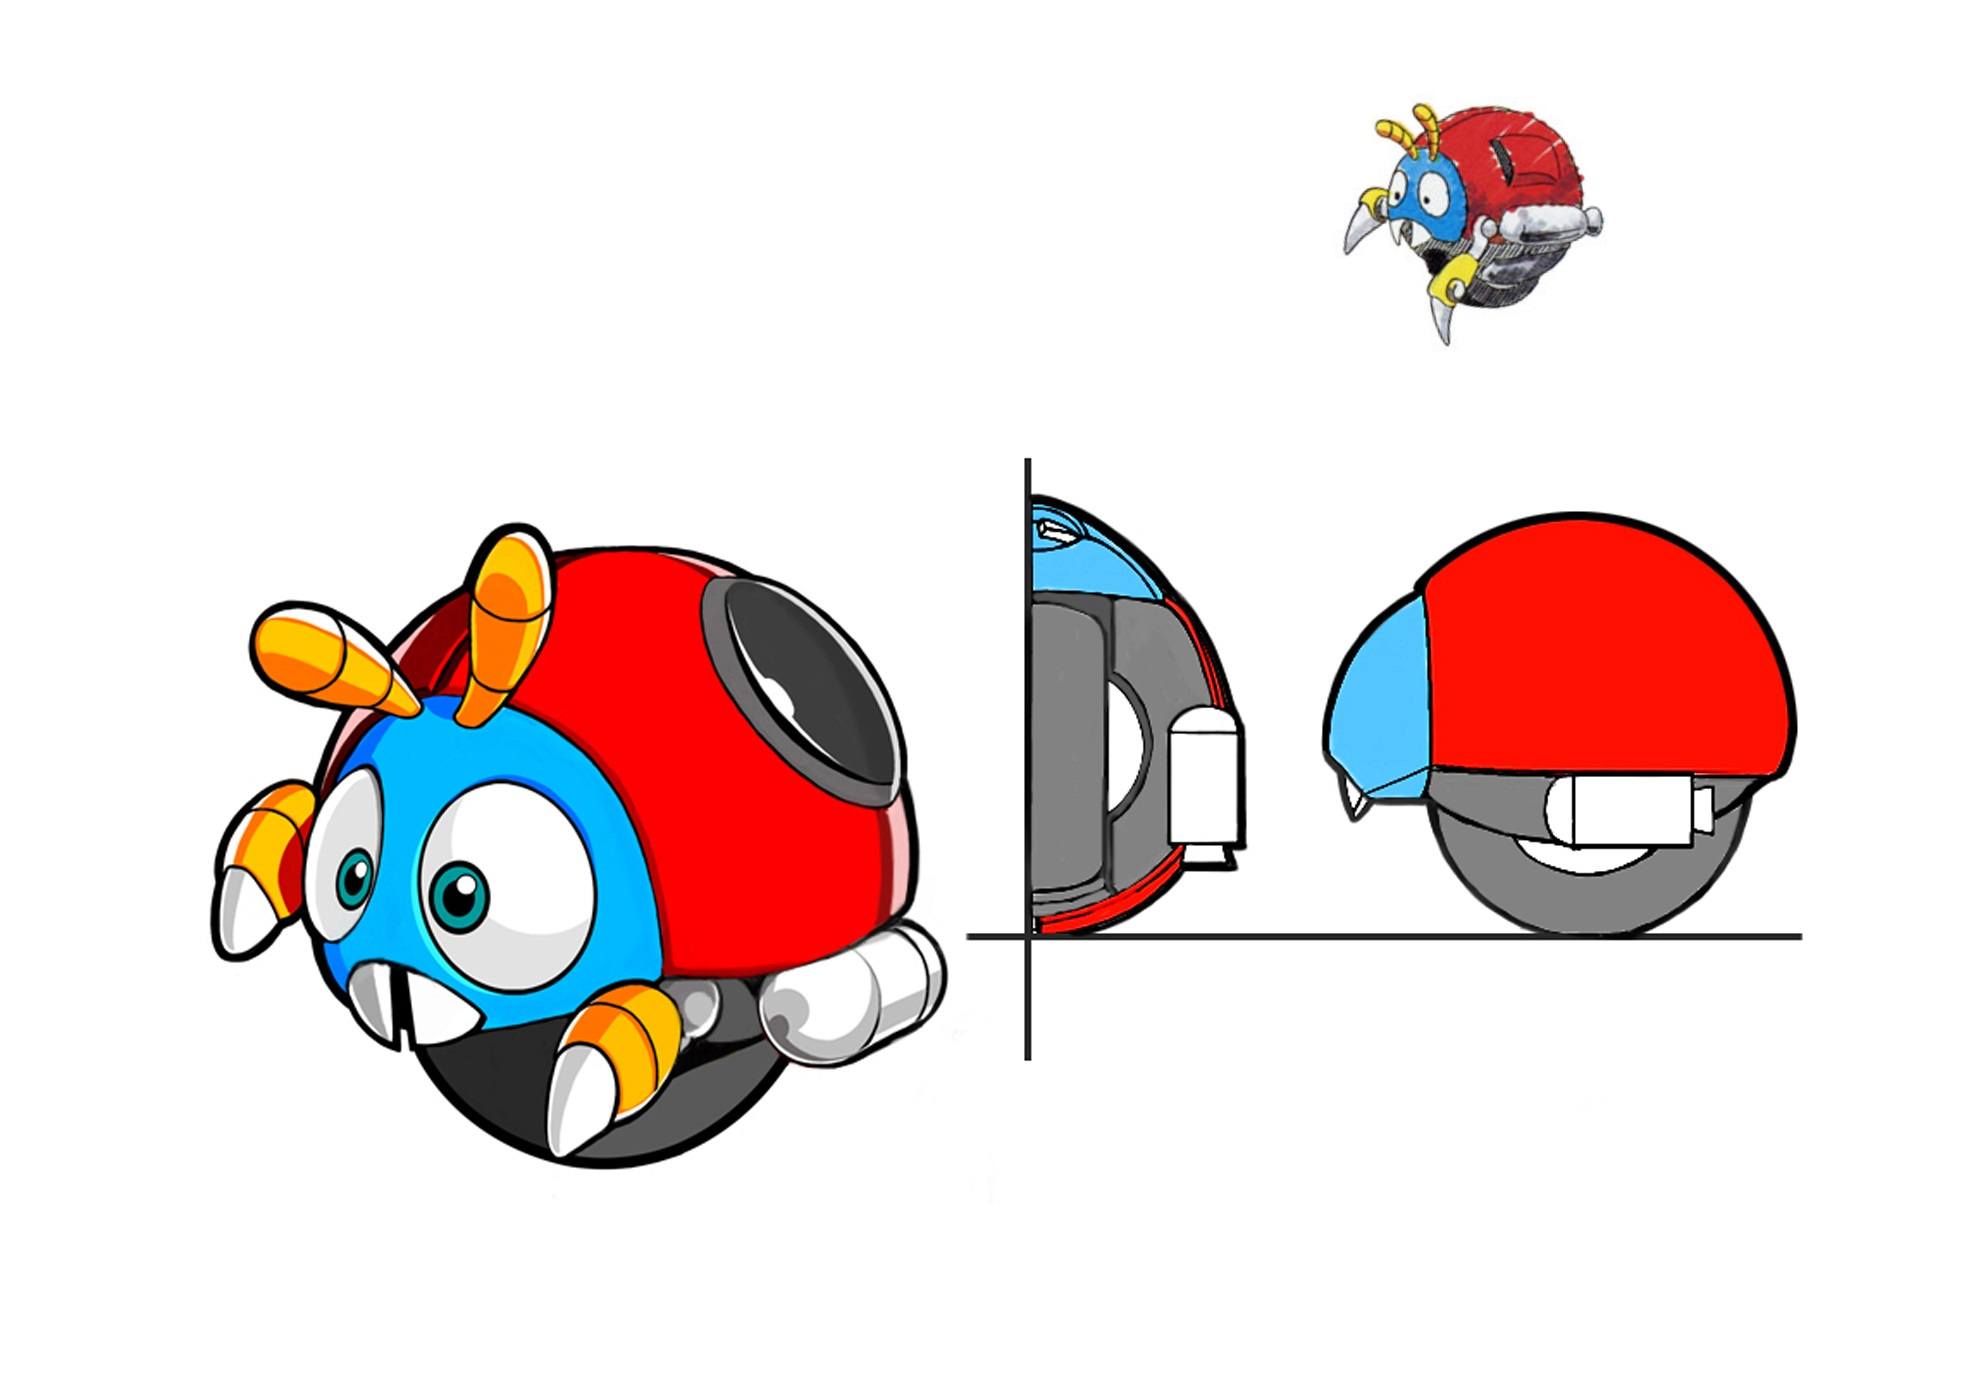 File:SLW Motobug Concept Artwork.jpg